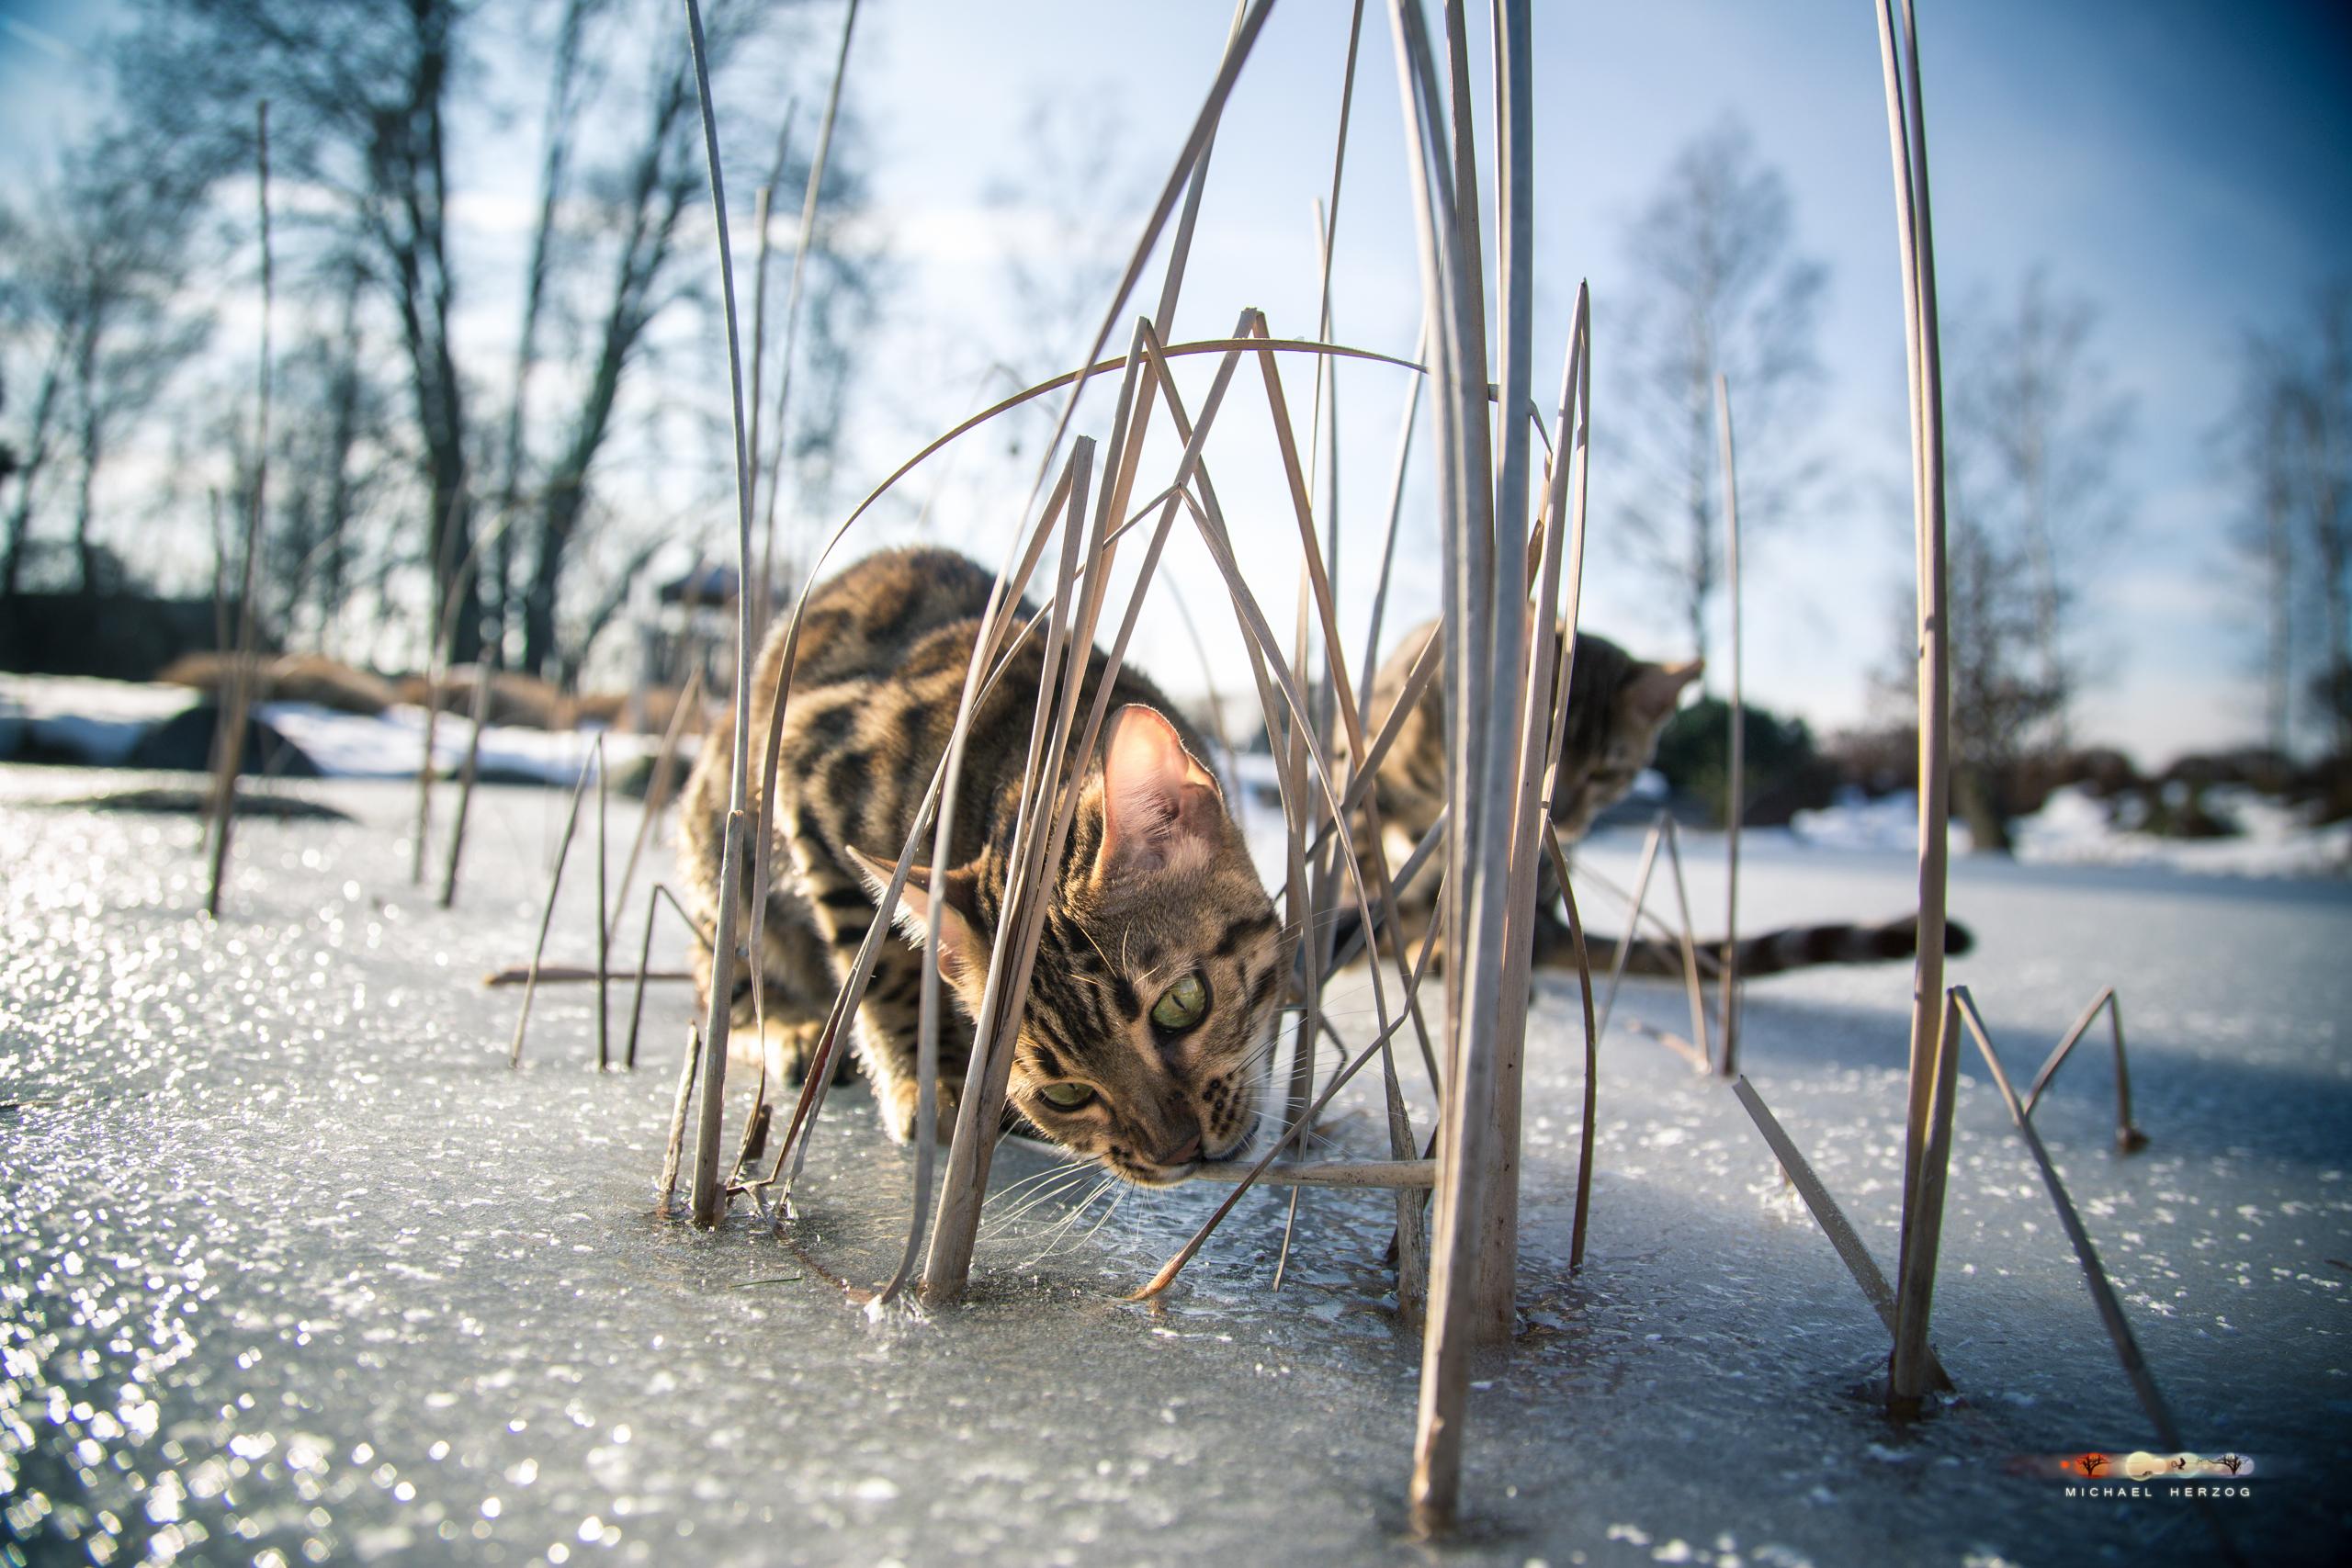 BALUARI_Winter2019_Garten_MichaelHerzog-8793.jpg